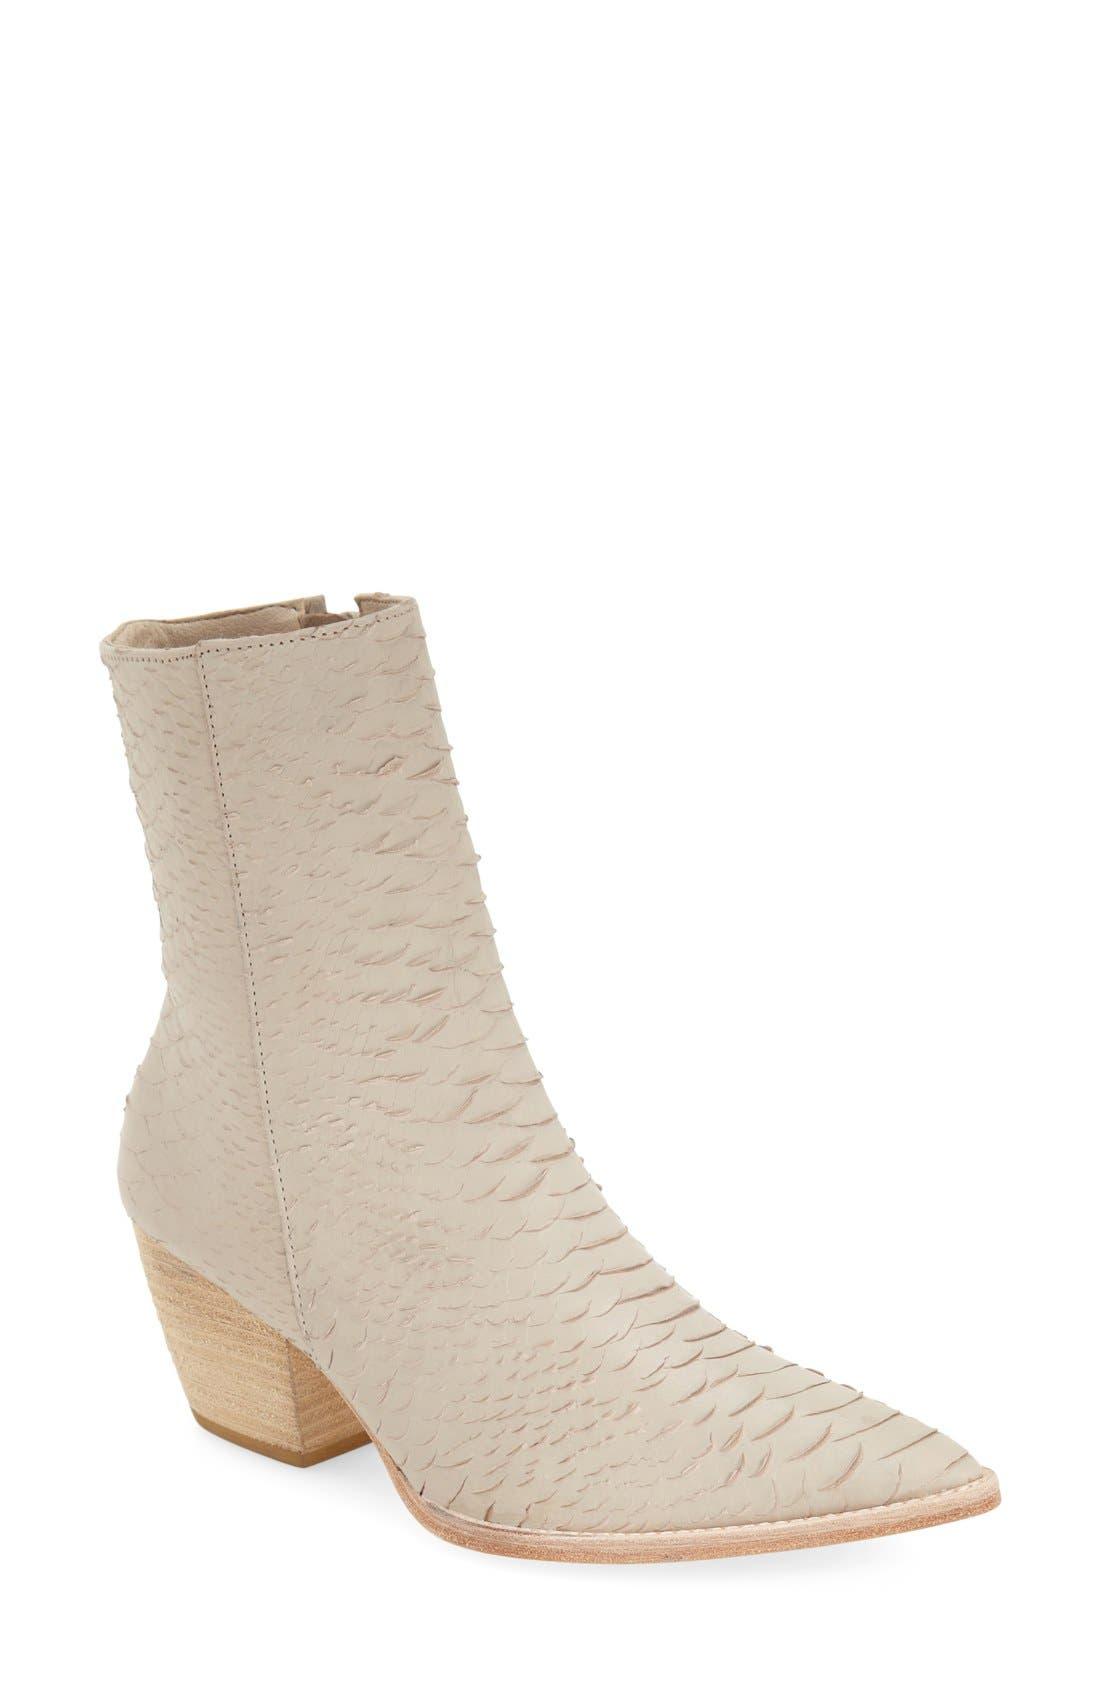 Main Image - Matisse 'Caty' Western Pointy Toe Bootie (Women)